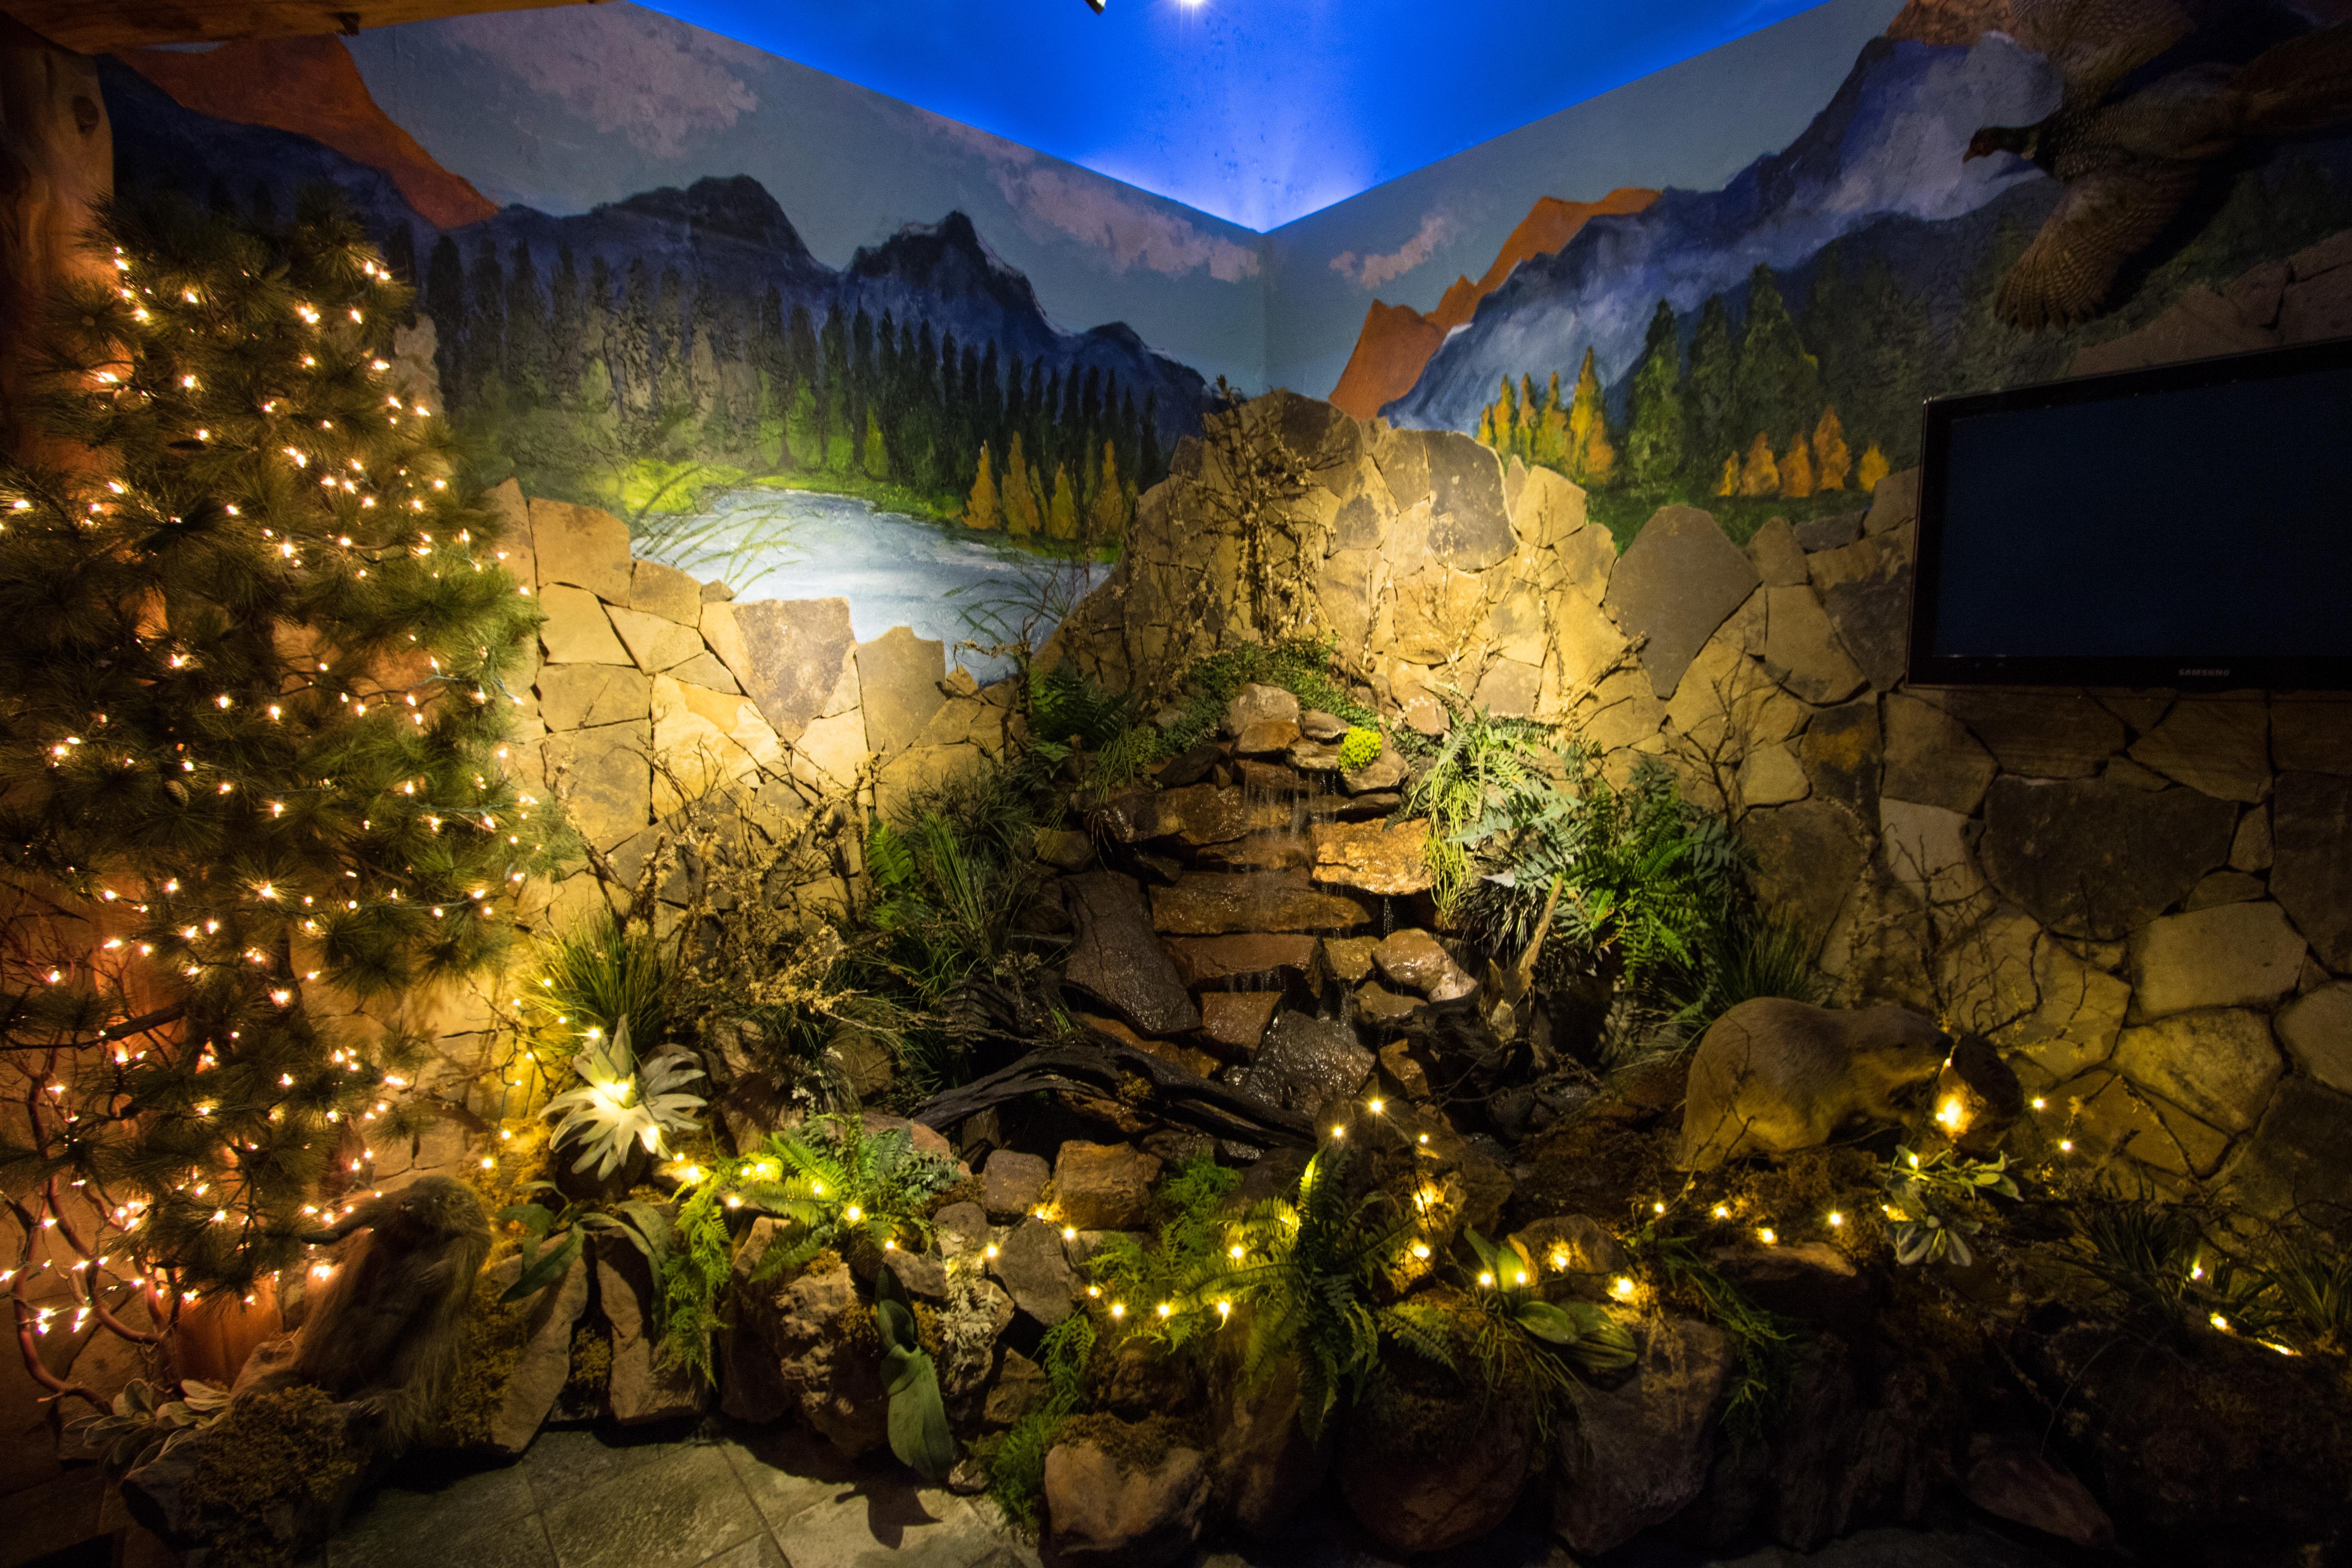 The Lodge Main Entrance Waterfall